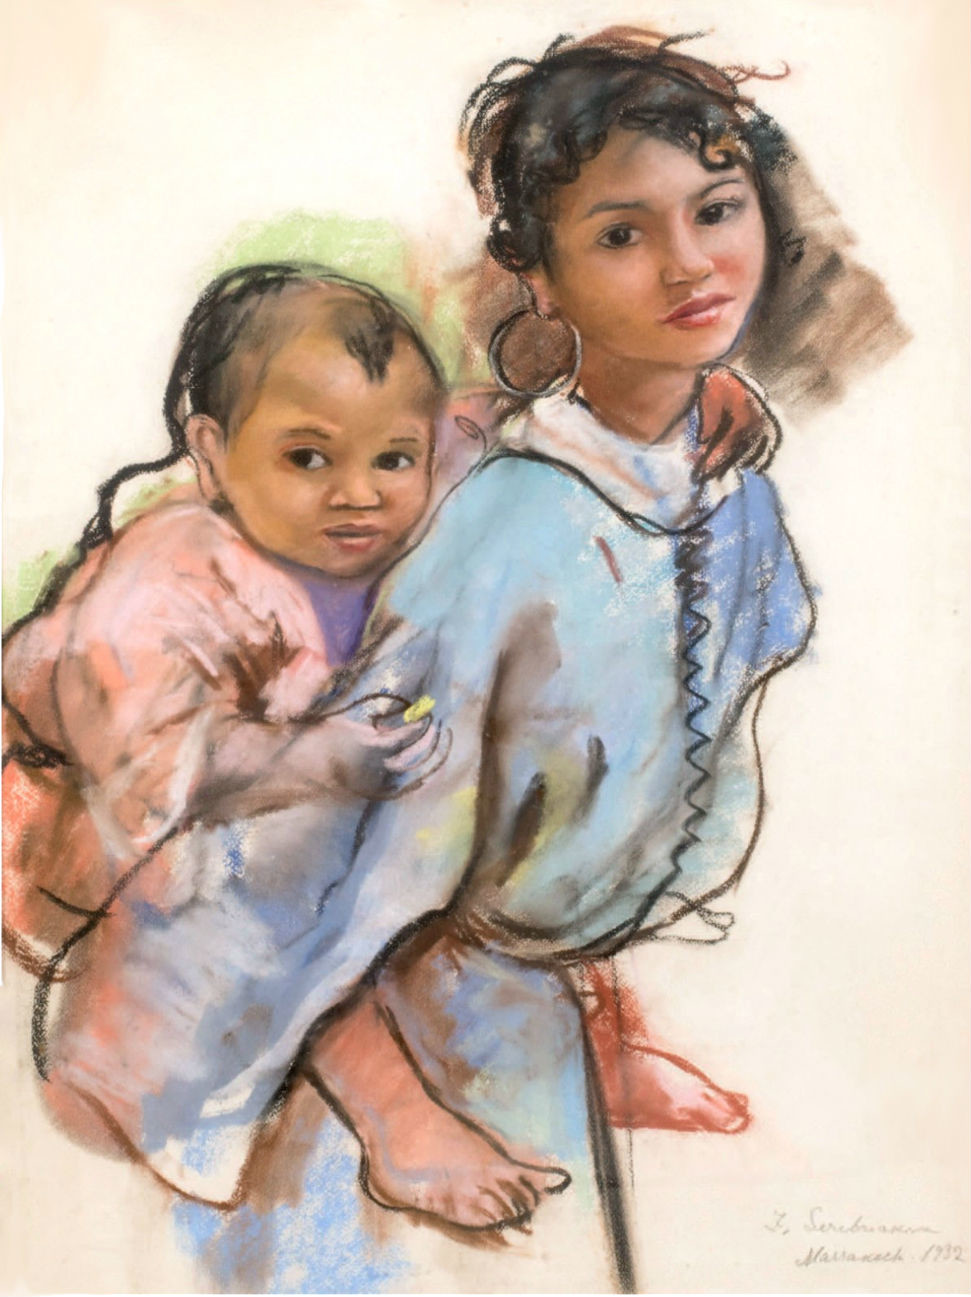 Mère et enfant par Zinaïda Serebriakova, 1932